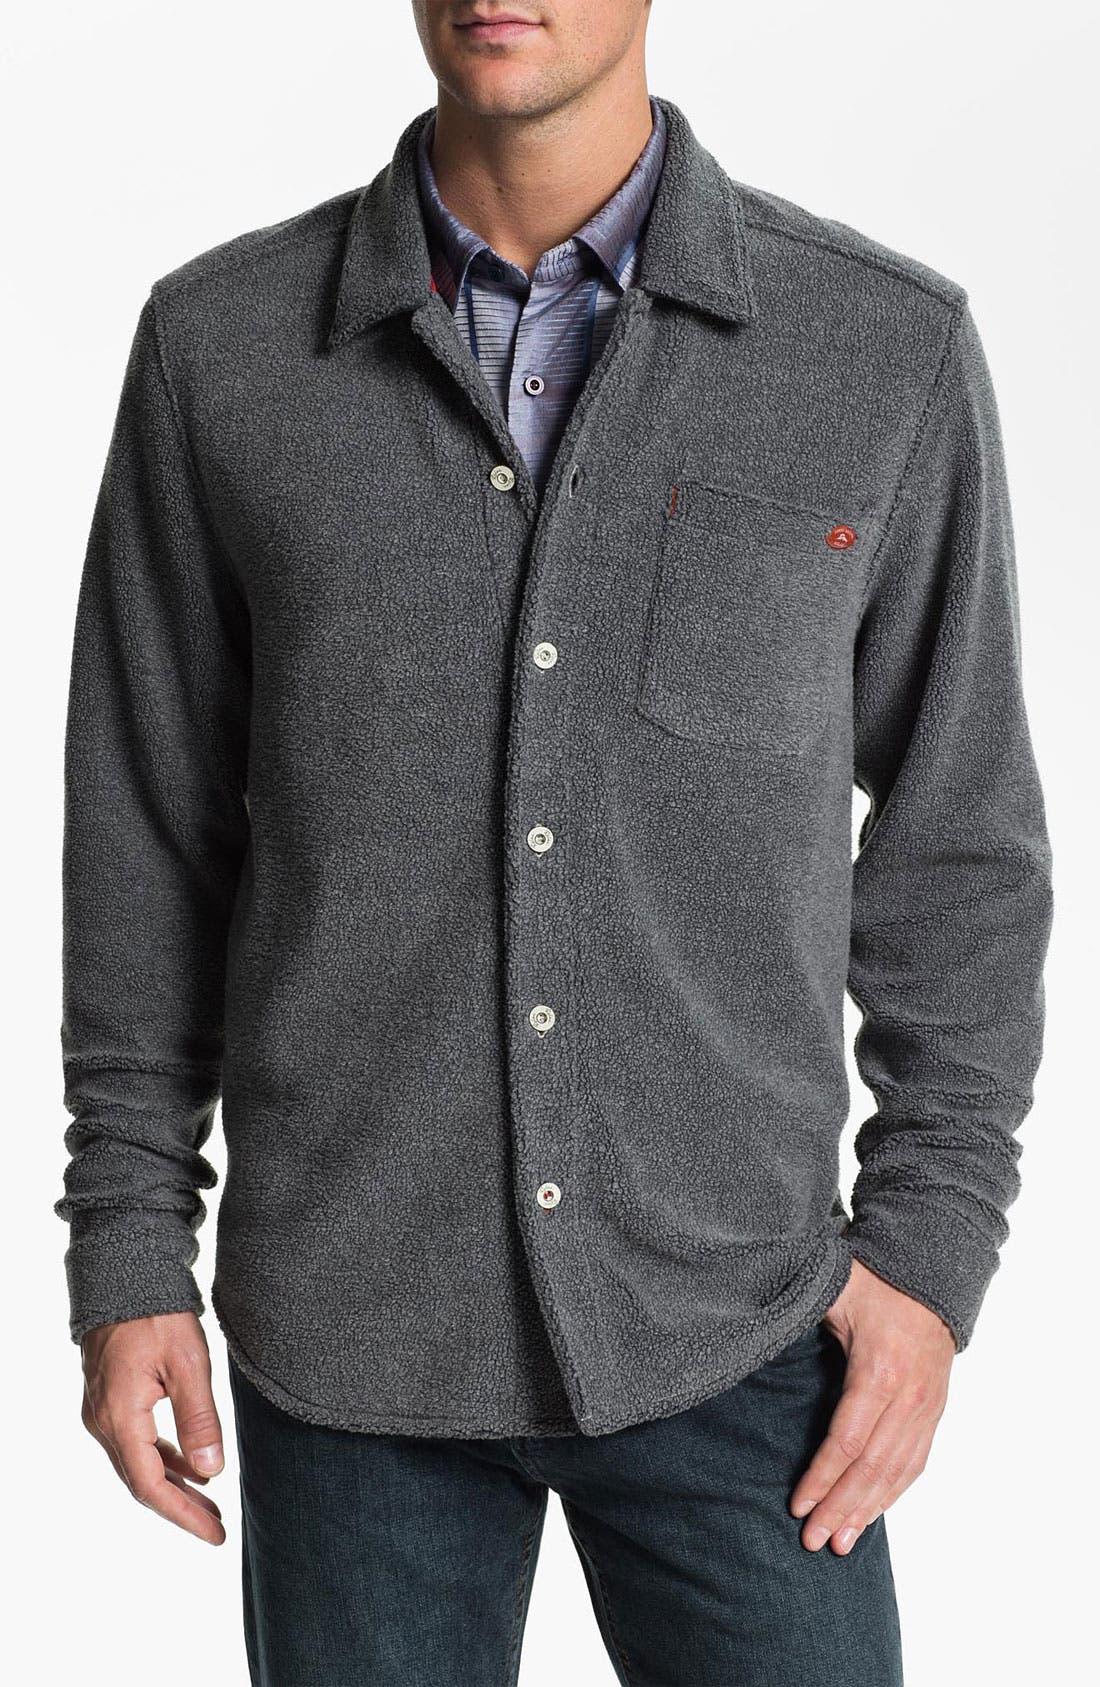 Alternate Image 1 Selected - Tommy Bahama 'Island Fleece CPO' Shirt Jacket